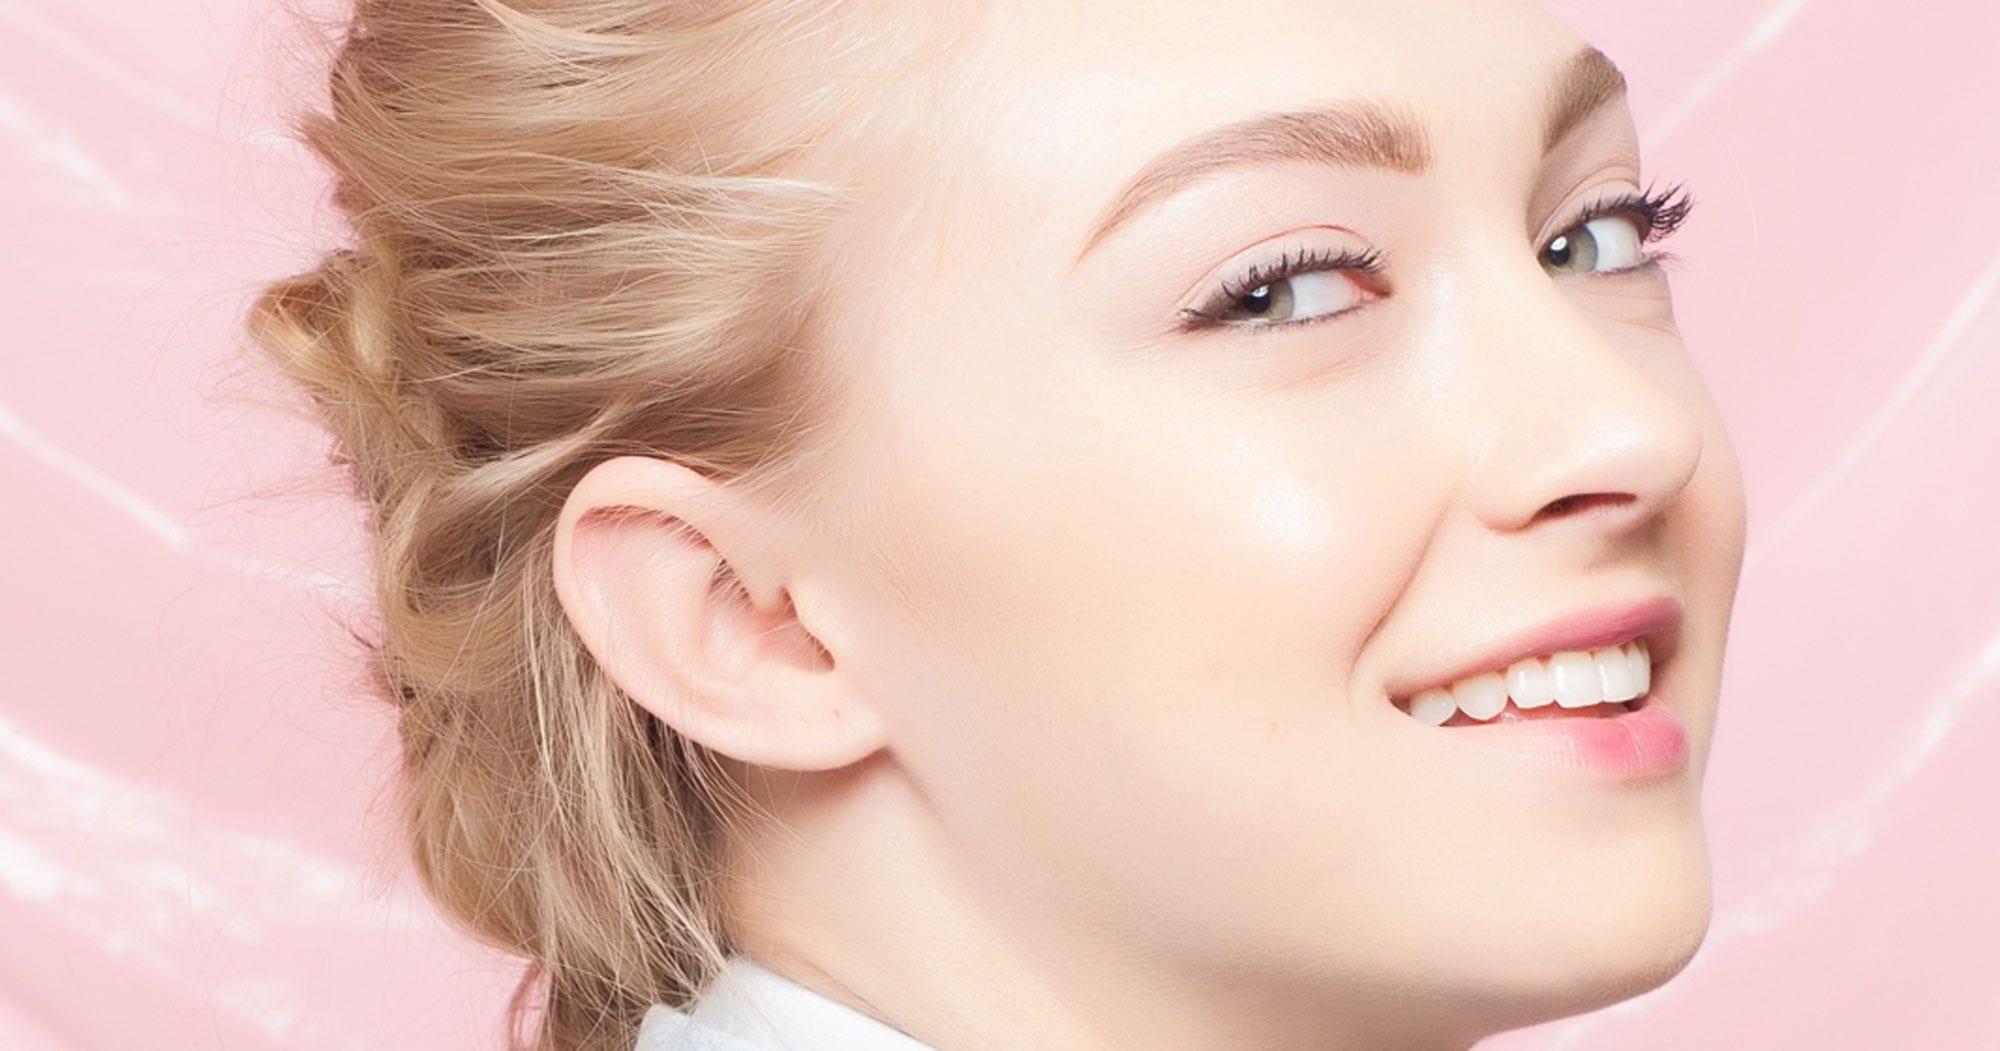 No joke: Blondes aren't dumb, science says